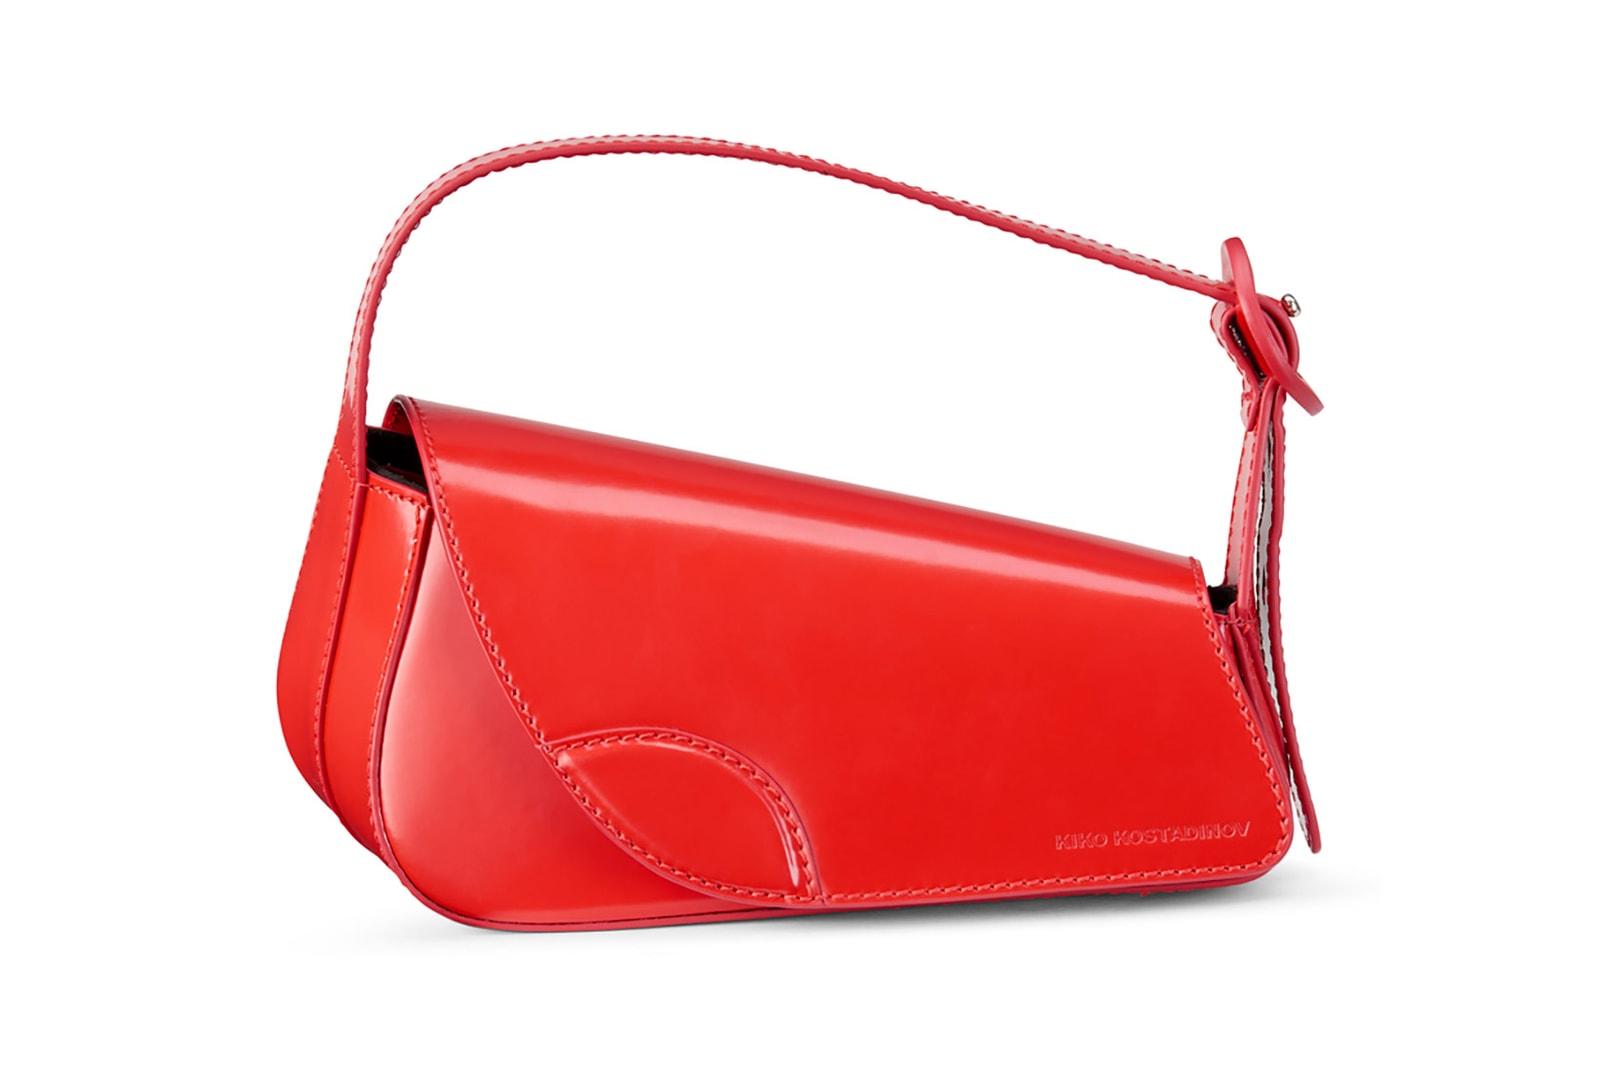 Kiko Kostadinov Trivia Baguette Bag Accessory Bella Hadid